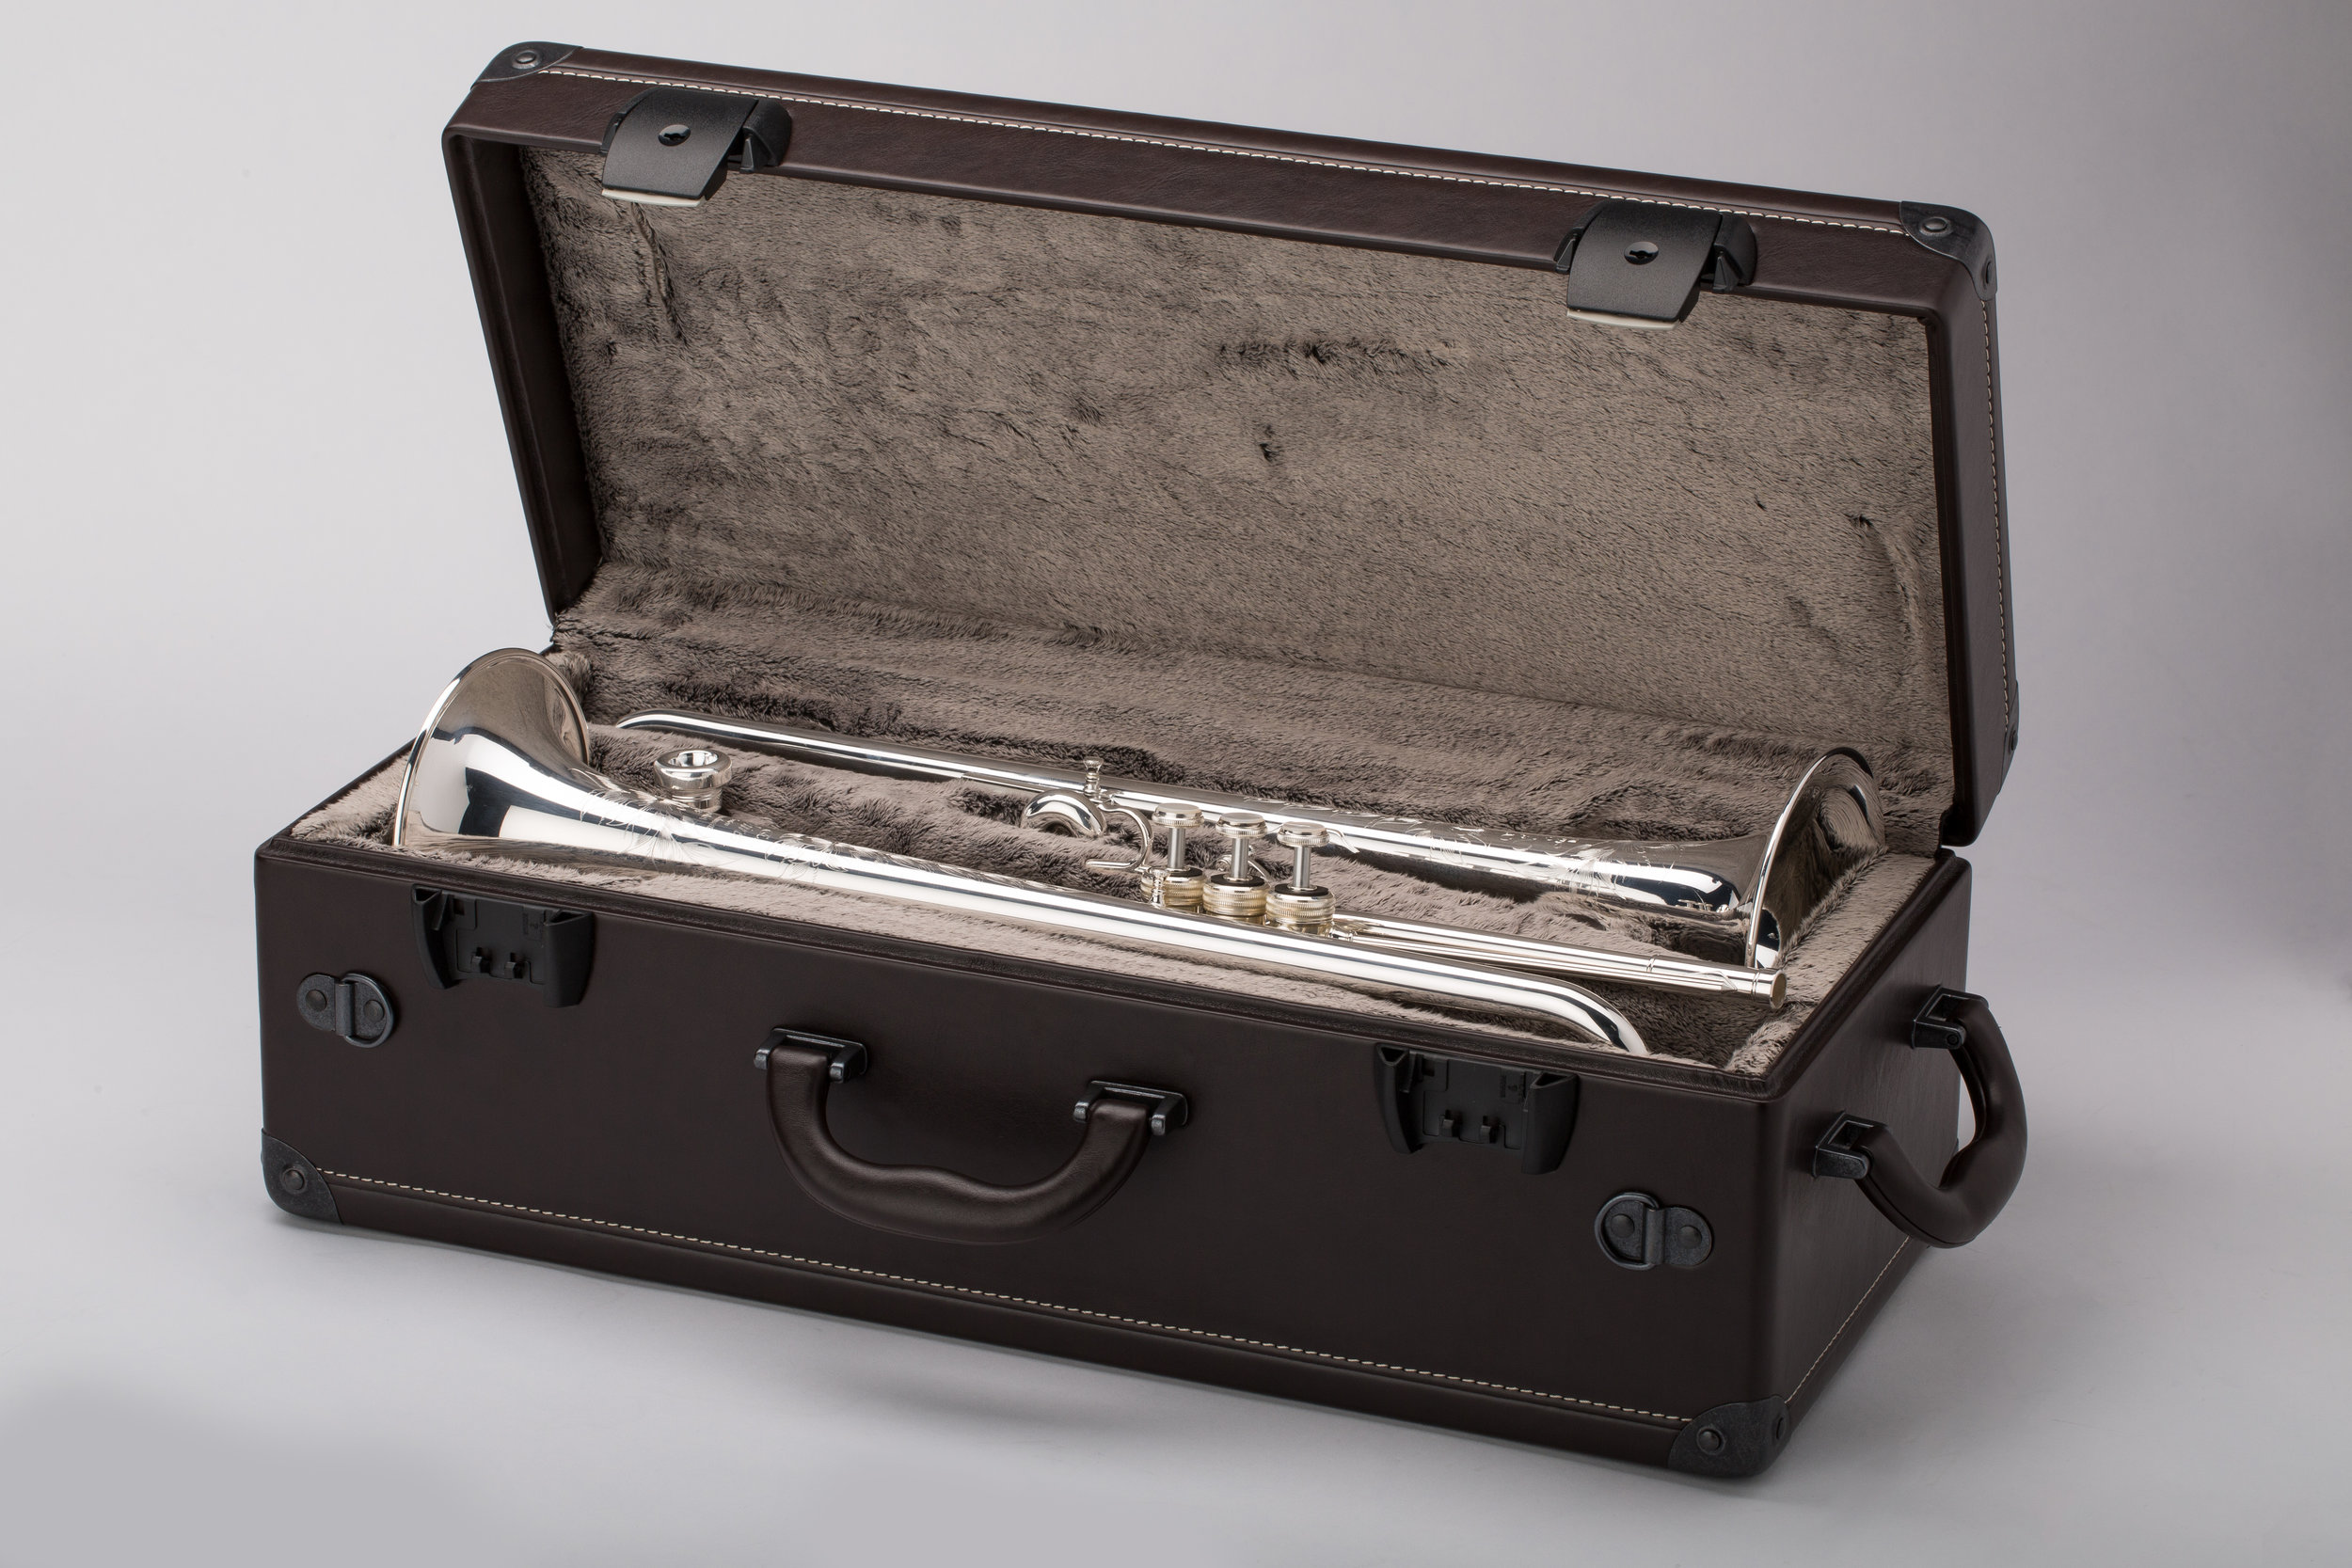 Shires_Case_Trumpet2_Open1_0317.jpg